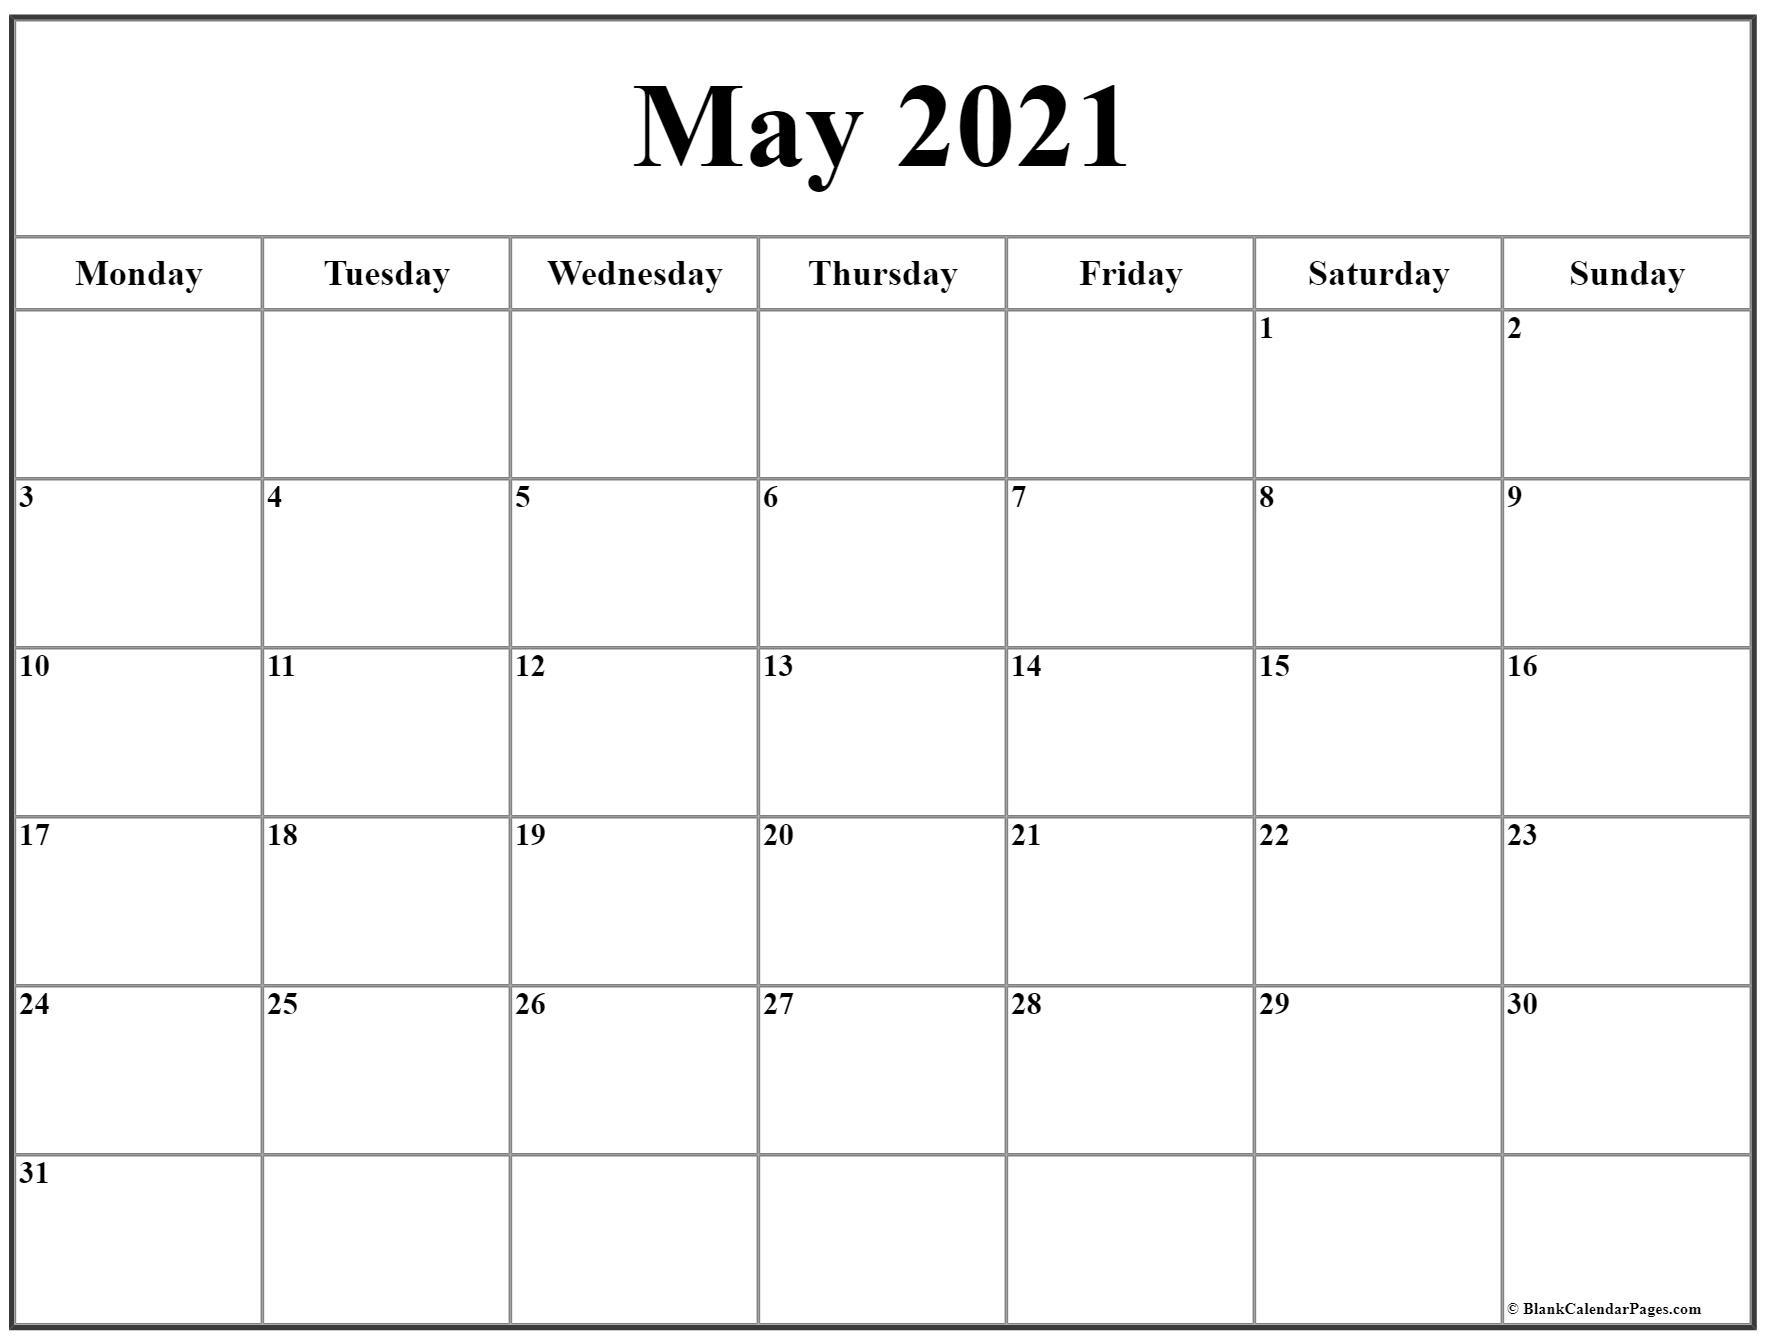 2021 Calendar Monday To Sunday intended for Calendar 2021 Monday Through Sunday